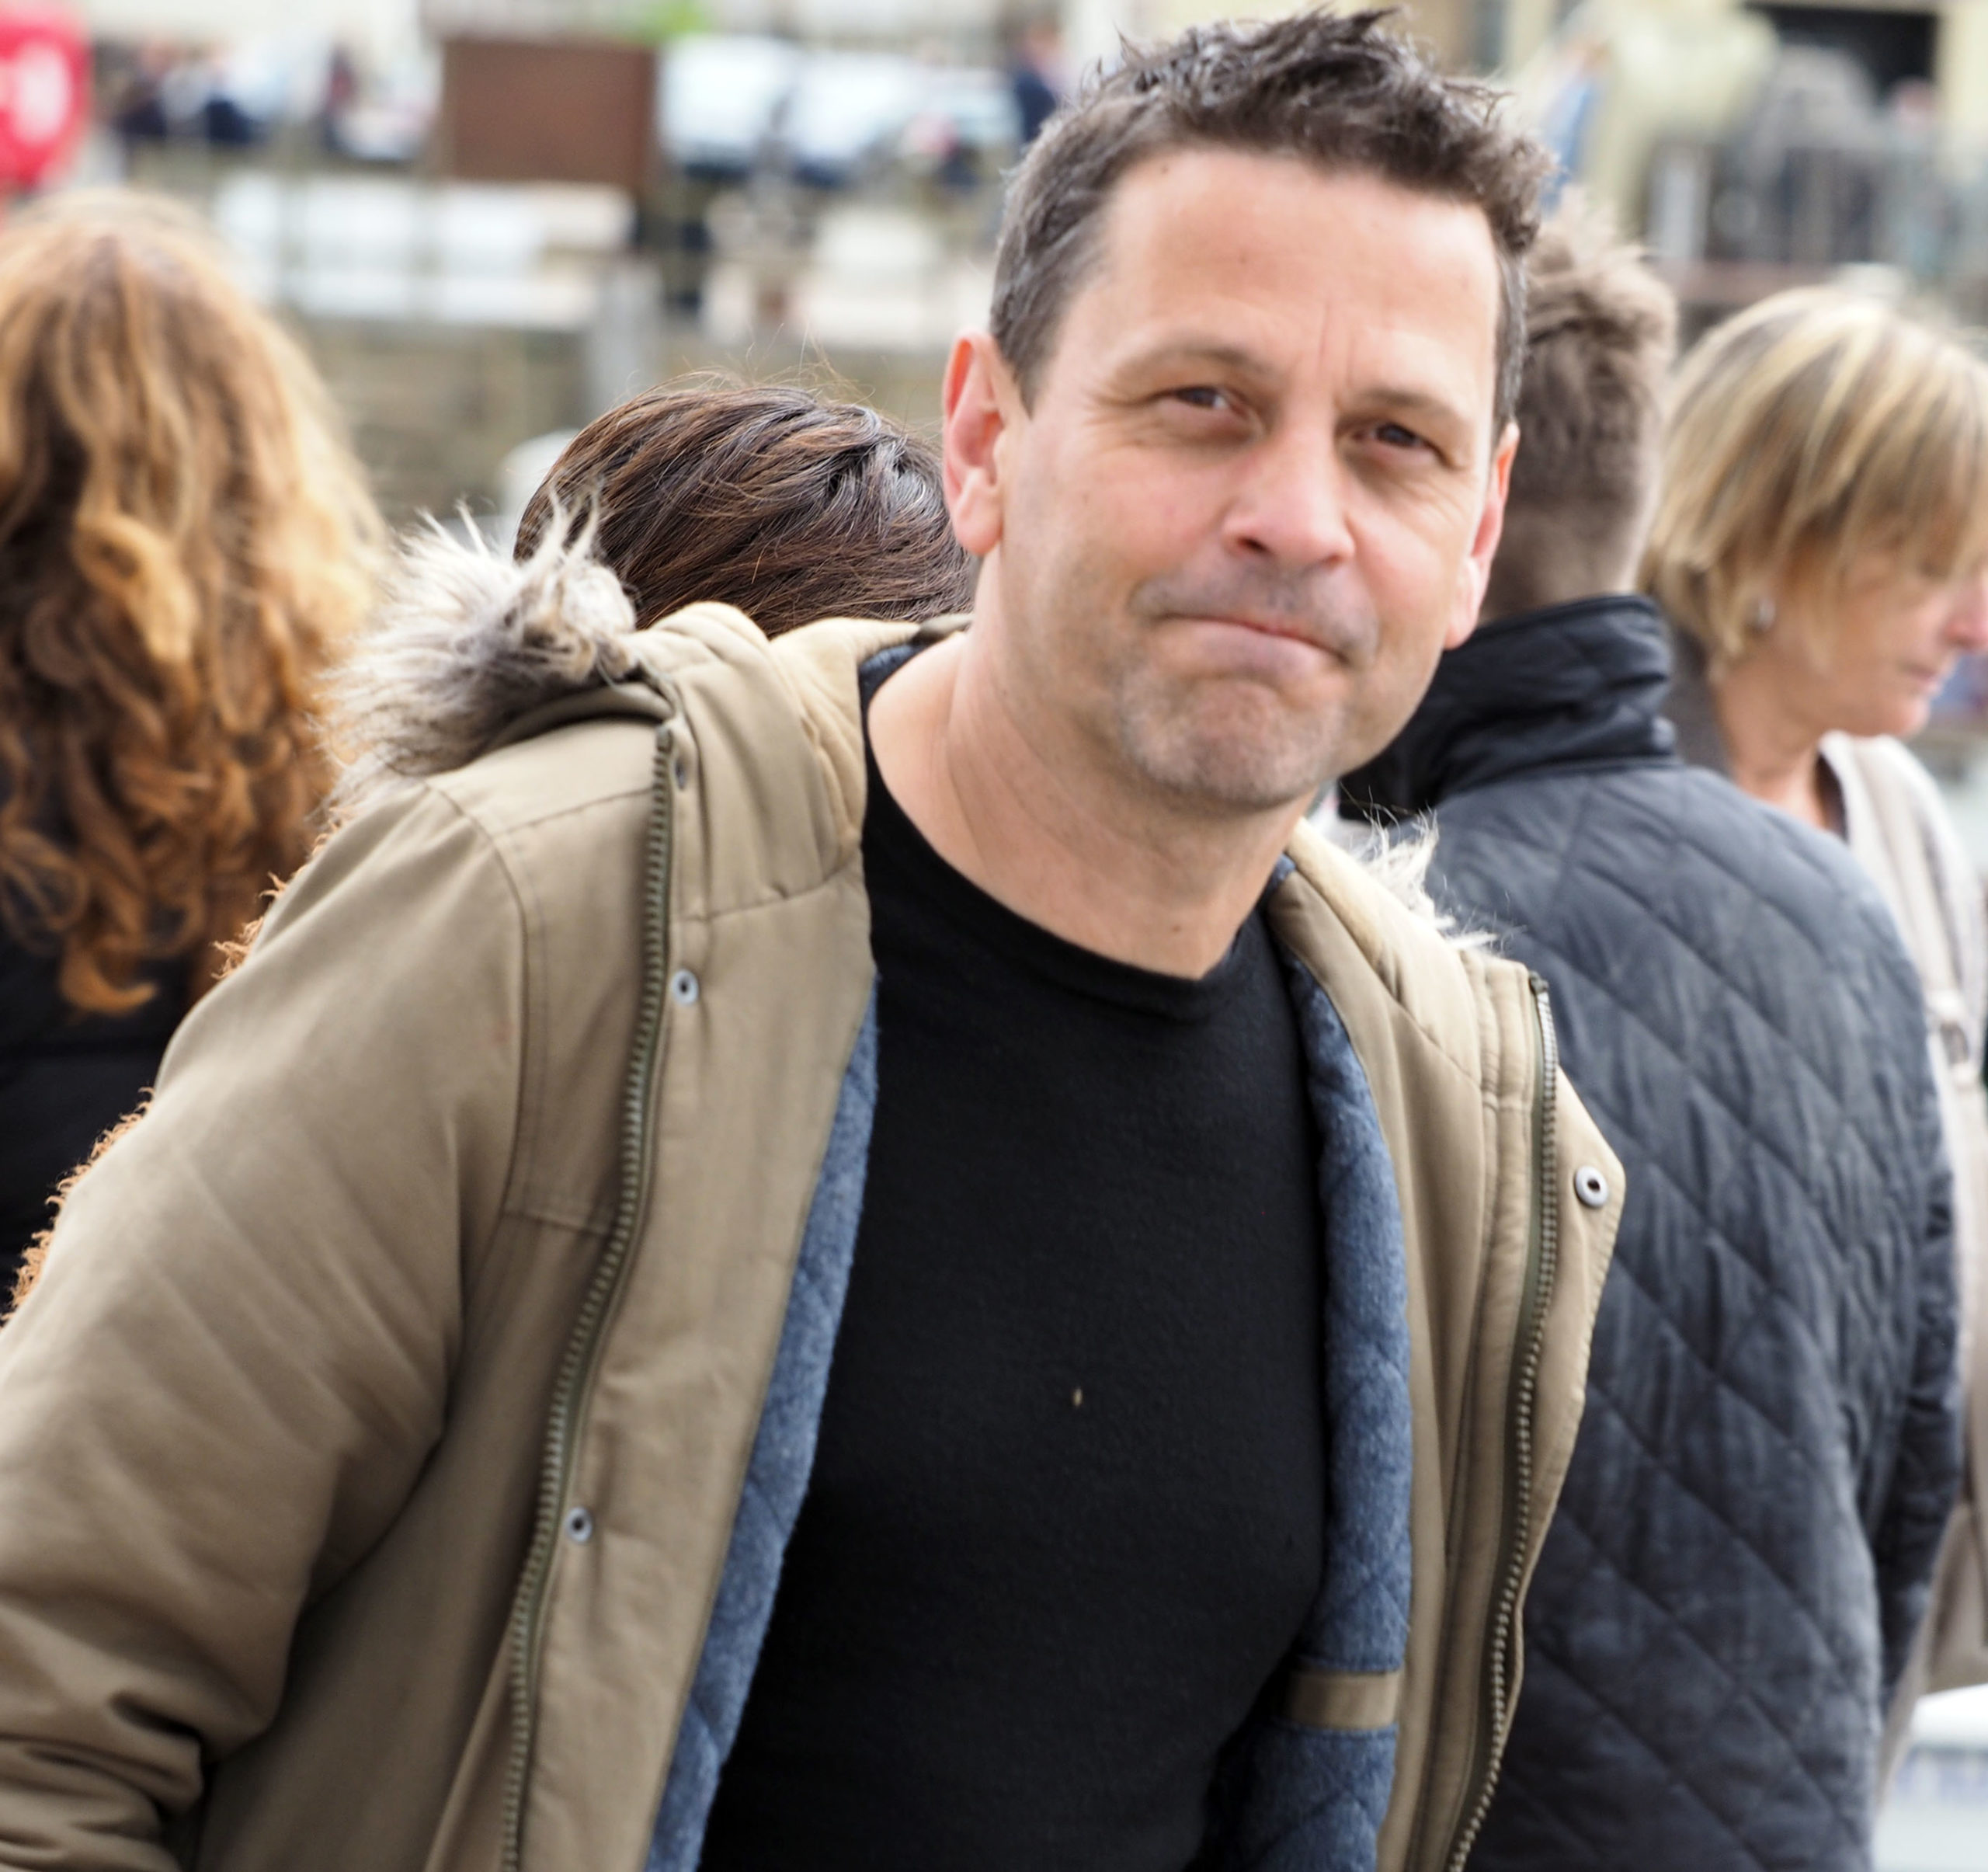 Julie Hesmondhalgh's husband Ian Kershaw (Credit: Shutterstock)